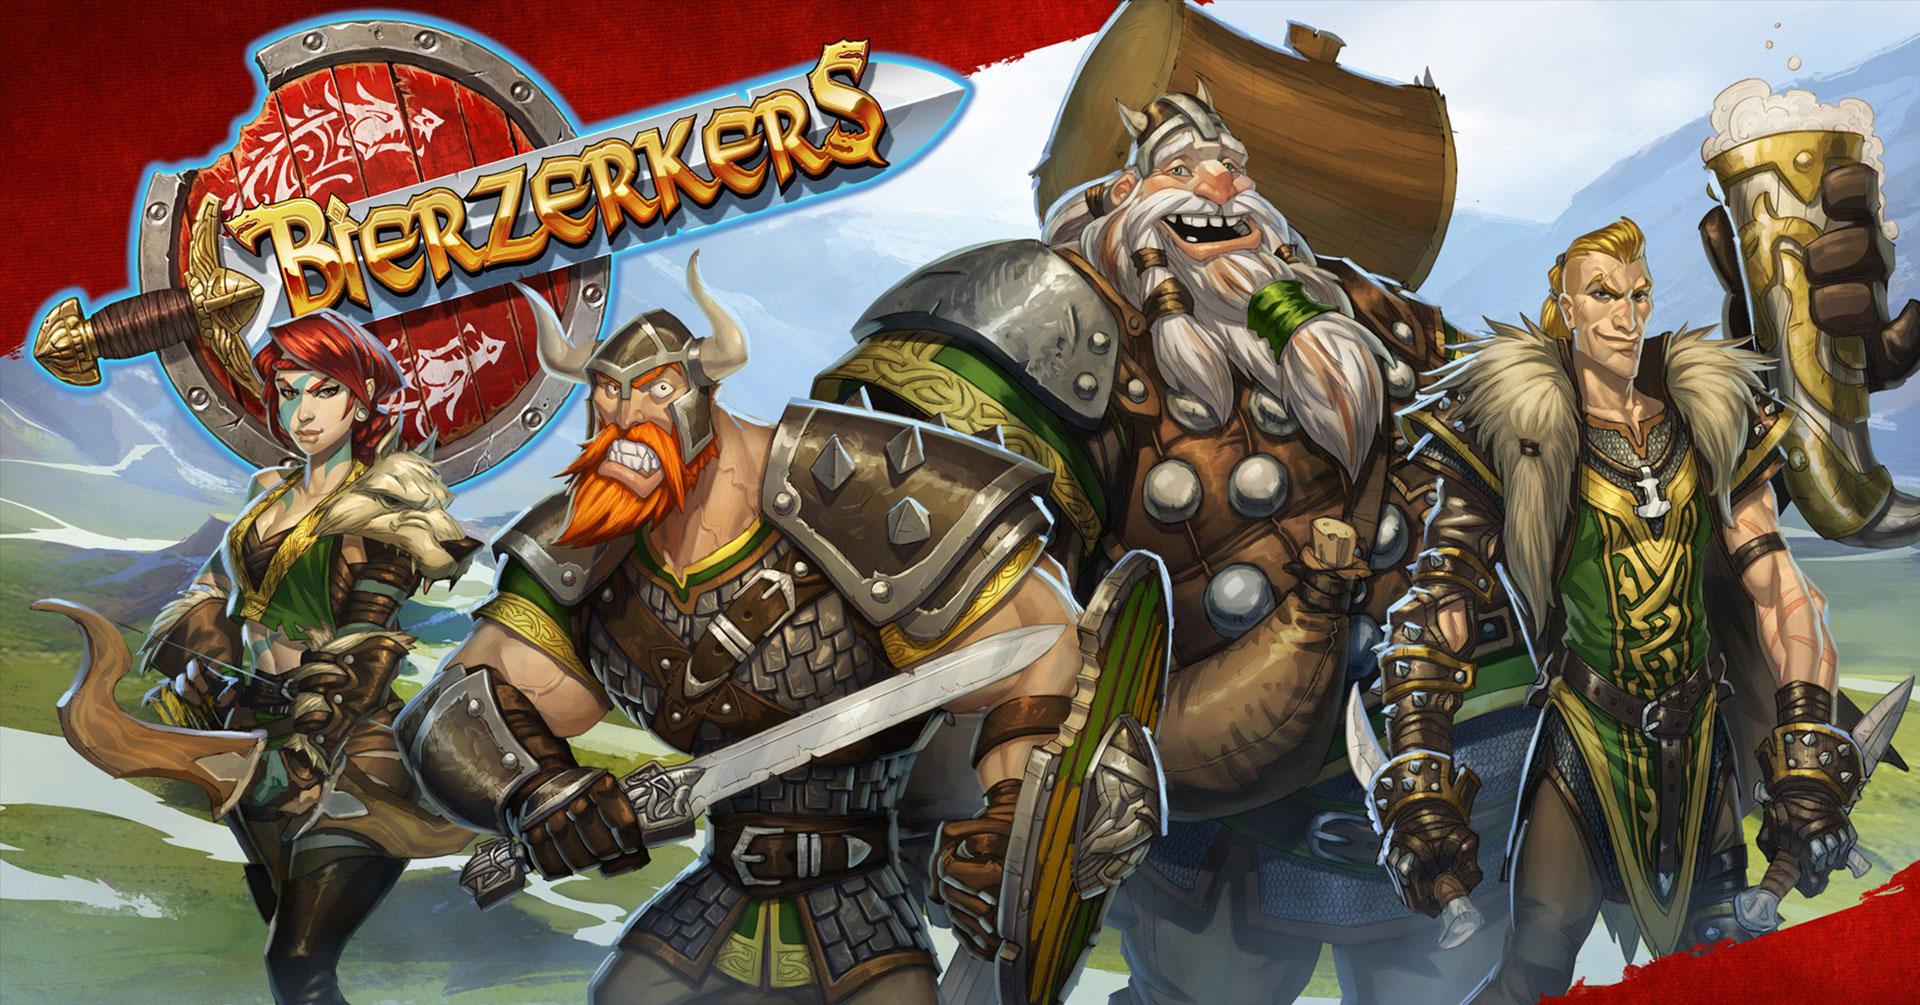 Weekend Warriors: Bierzerkers - Gaiscioch Magazine & Livestreams